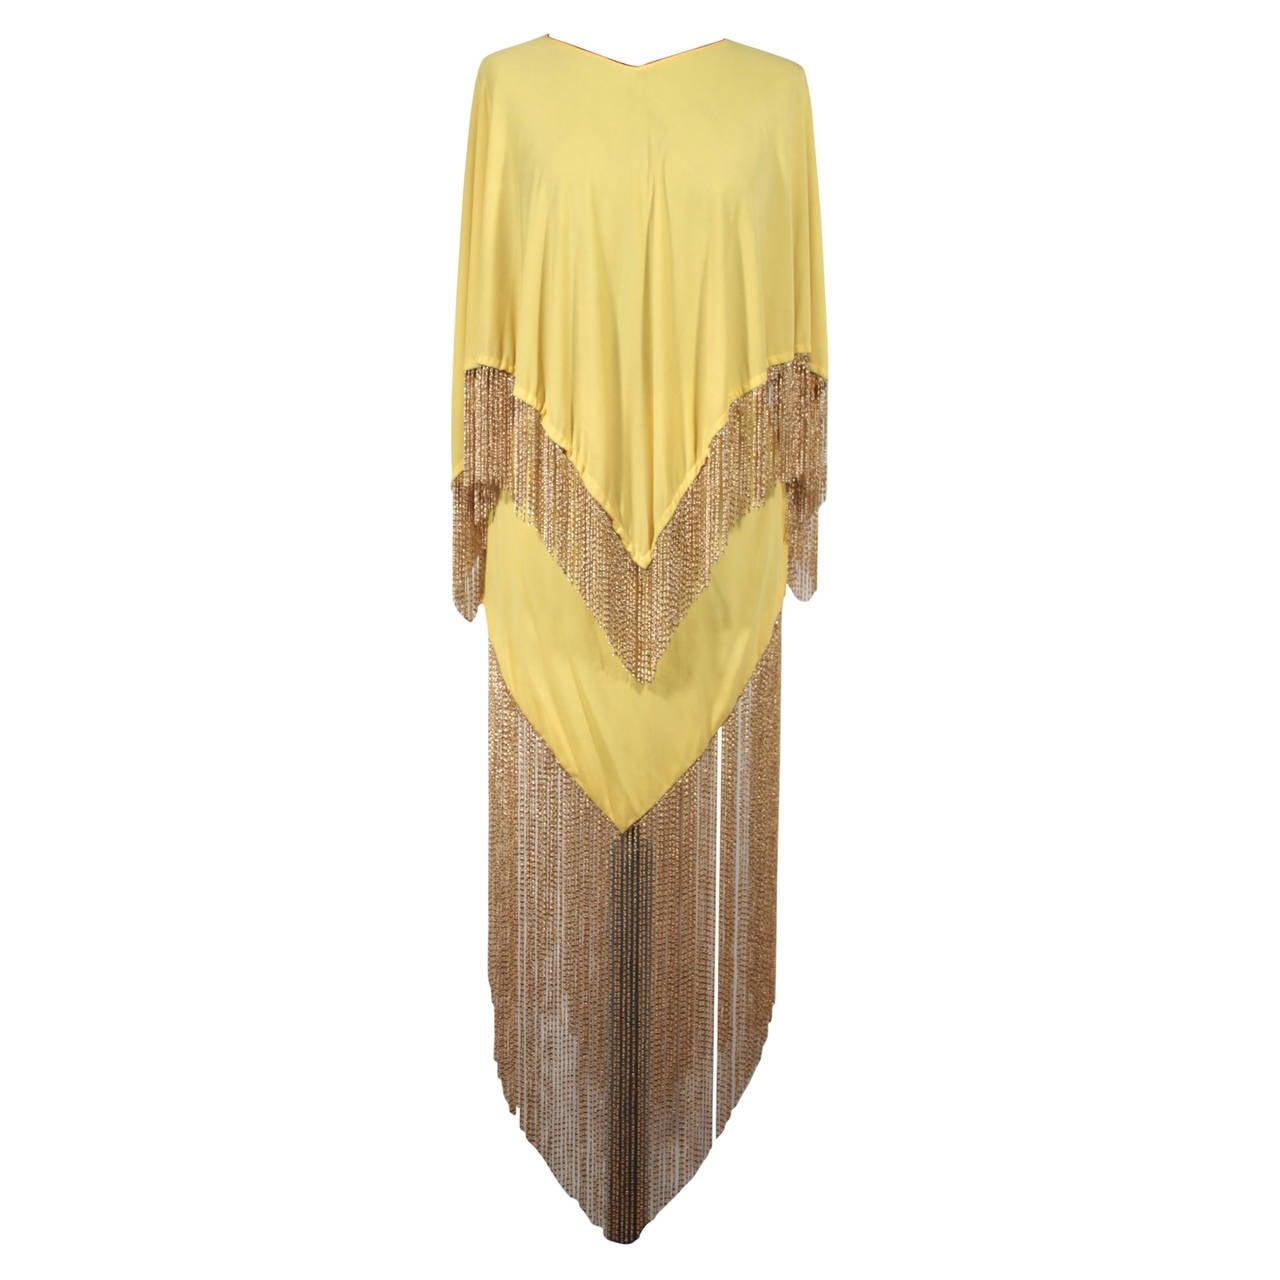 LORIS AZZARO Vintage 70s Yellow CAPE TOP & SKIRT SET Dress Long CHAIN FRINGES 1